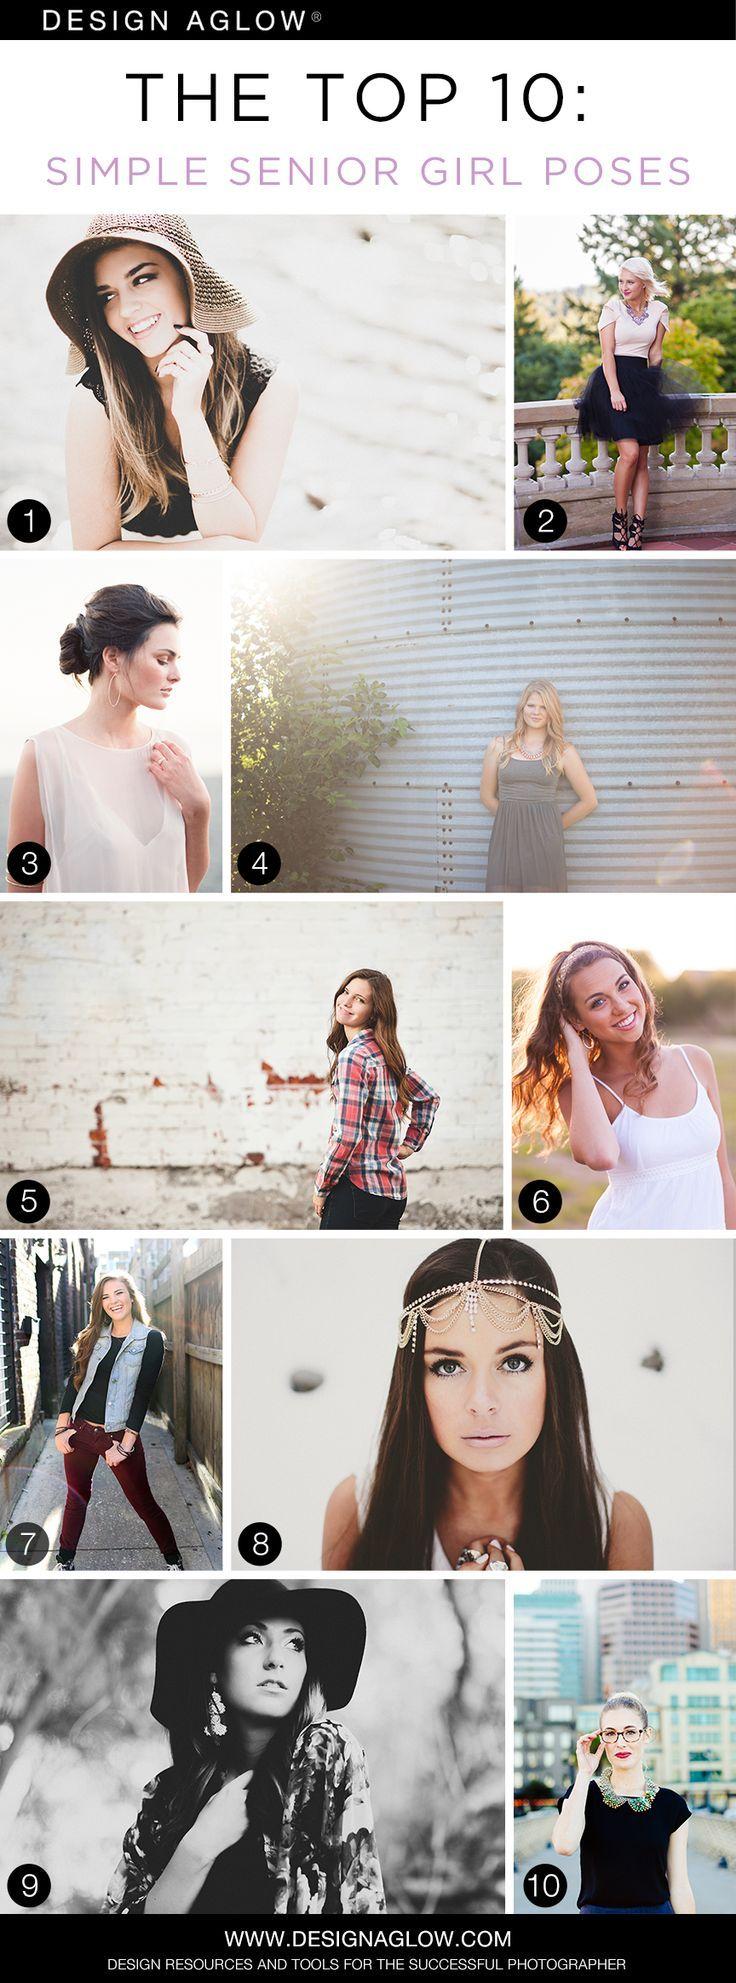 The Top 10: Simple Senior Girl Poses #designaglow